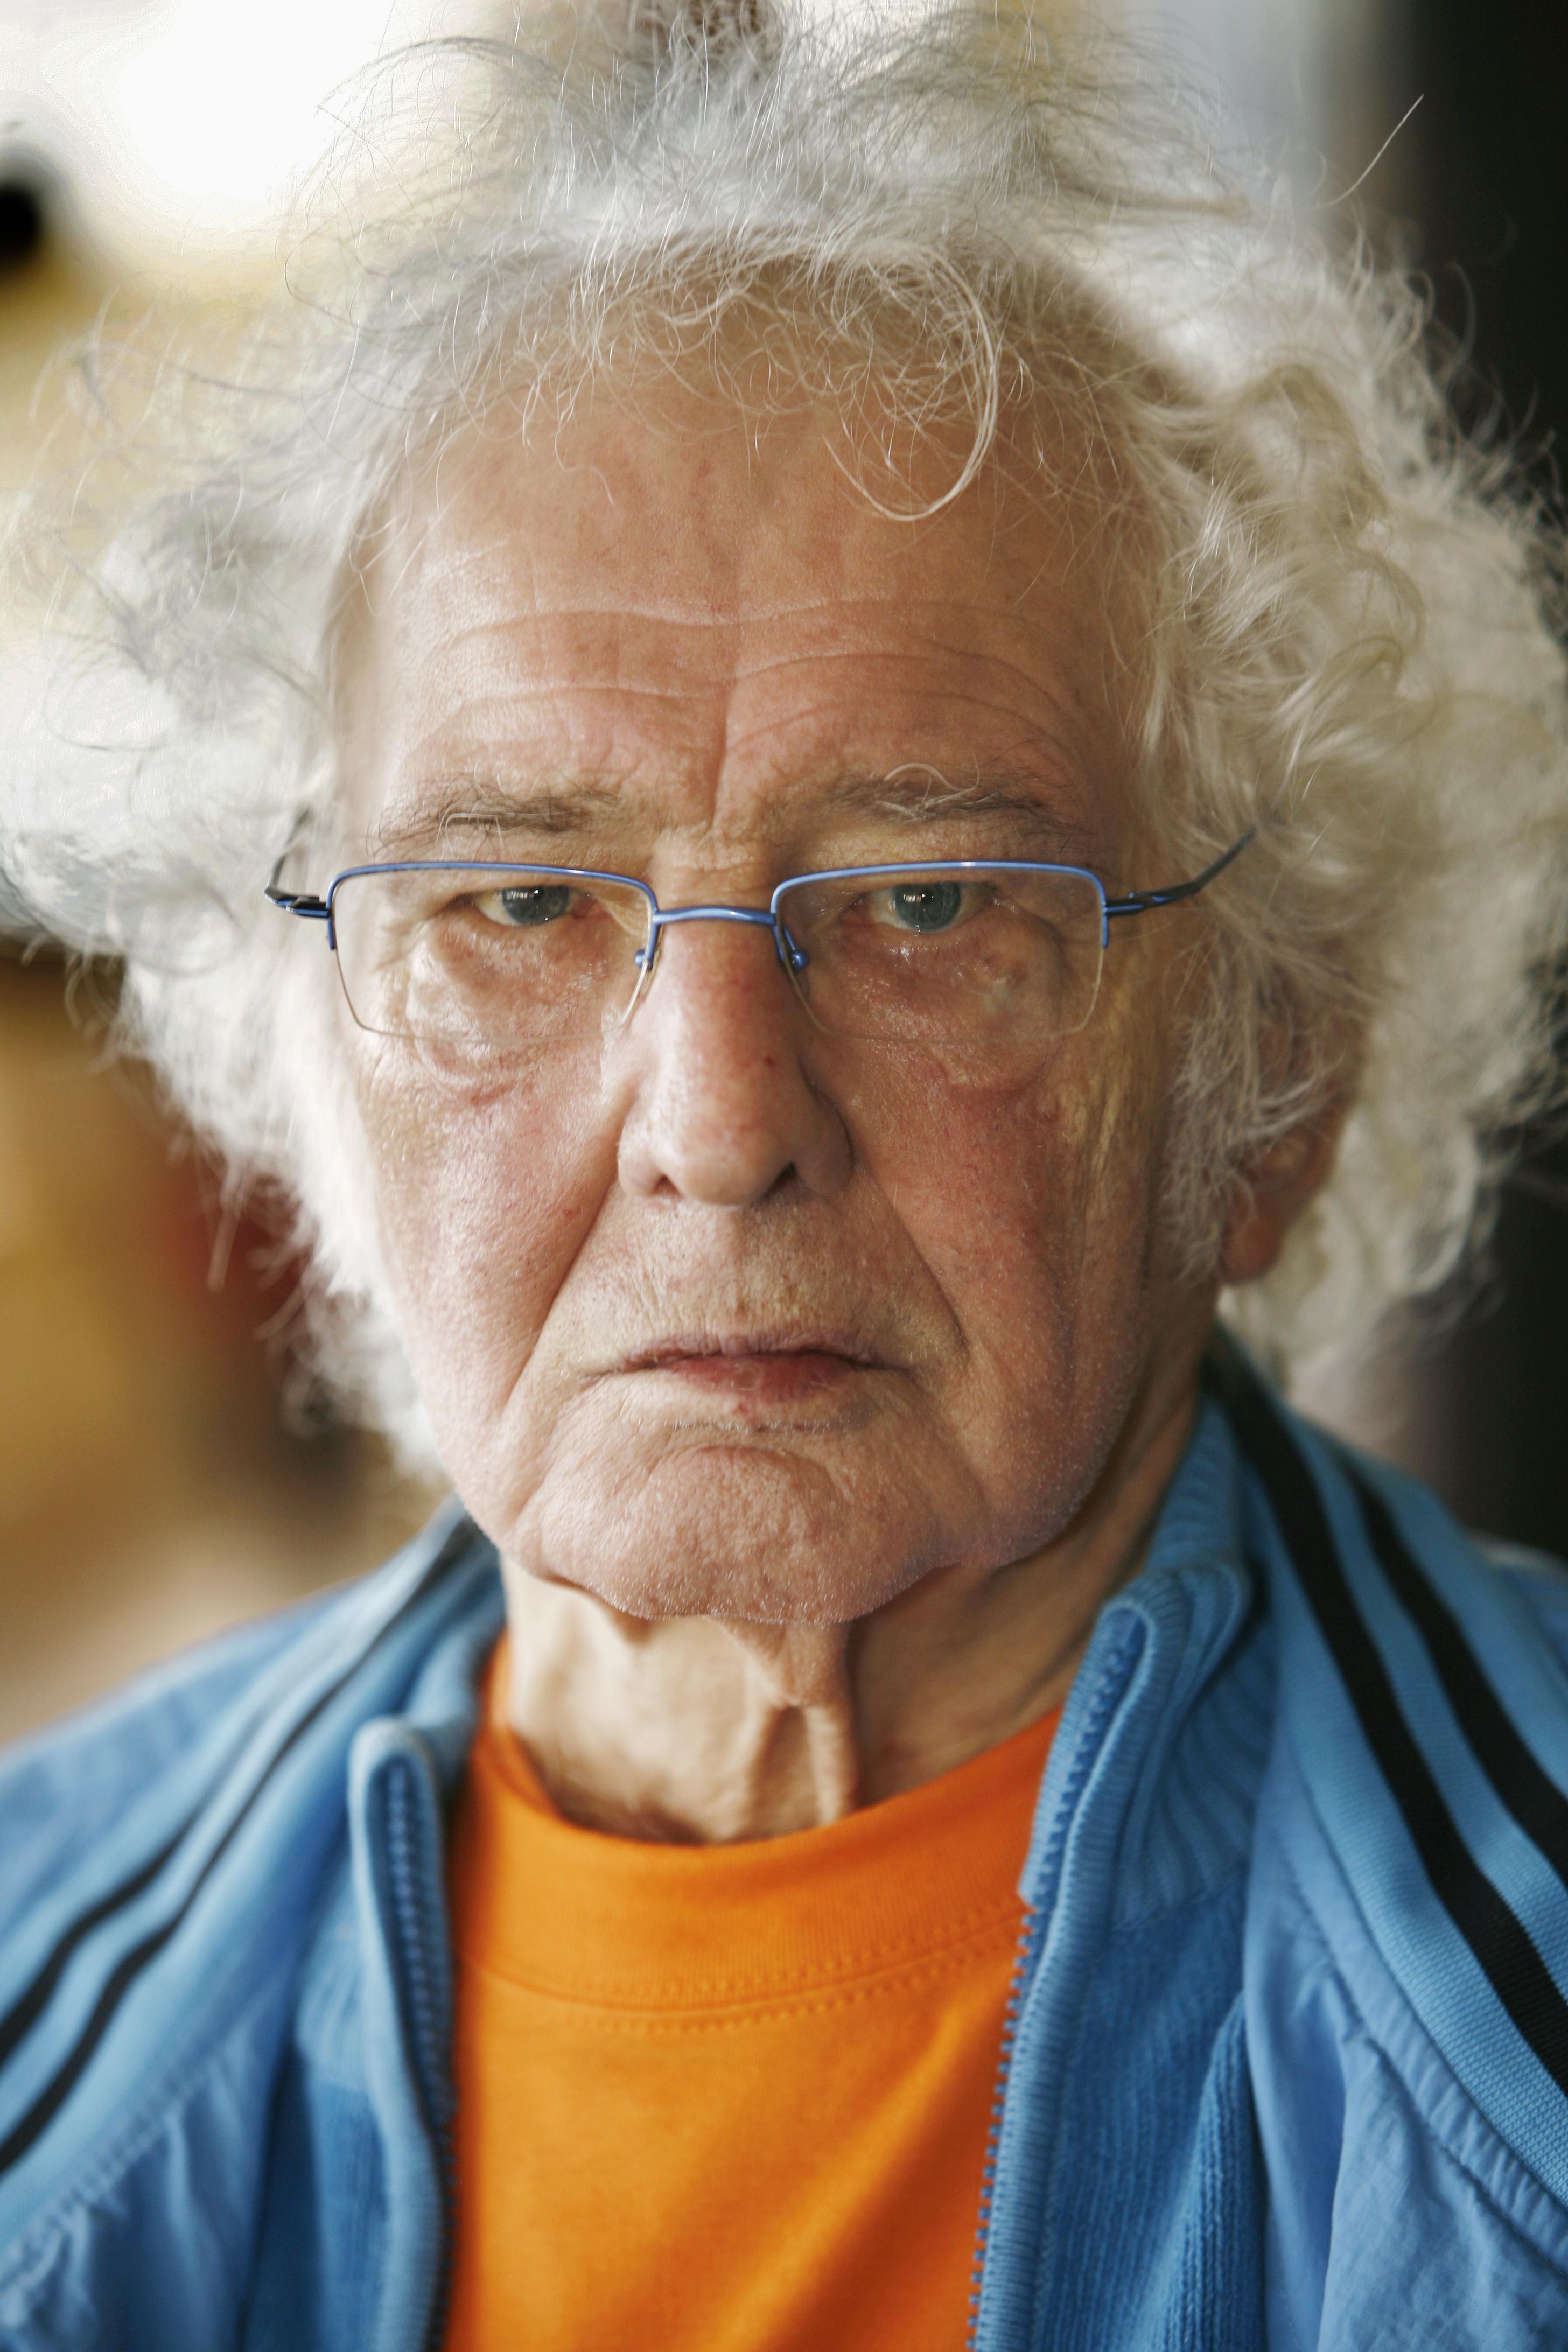 Biografie Jan Wolkers leidt tot exposities en muurgedicht